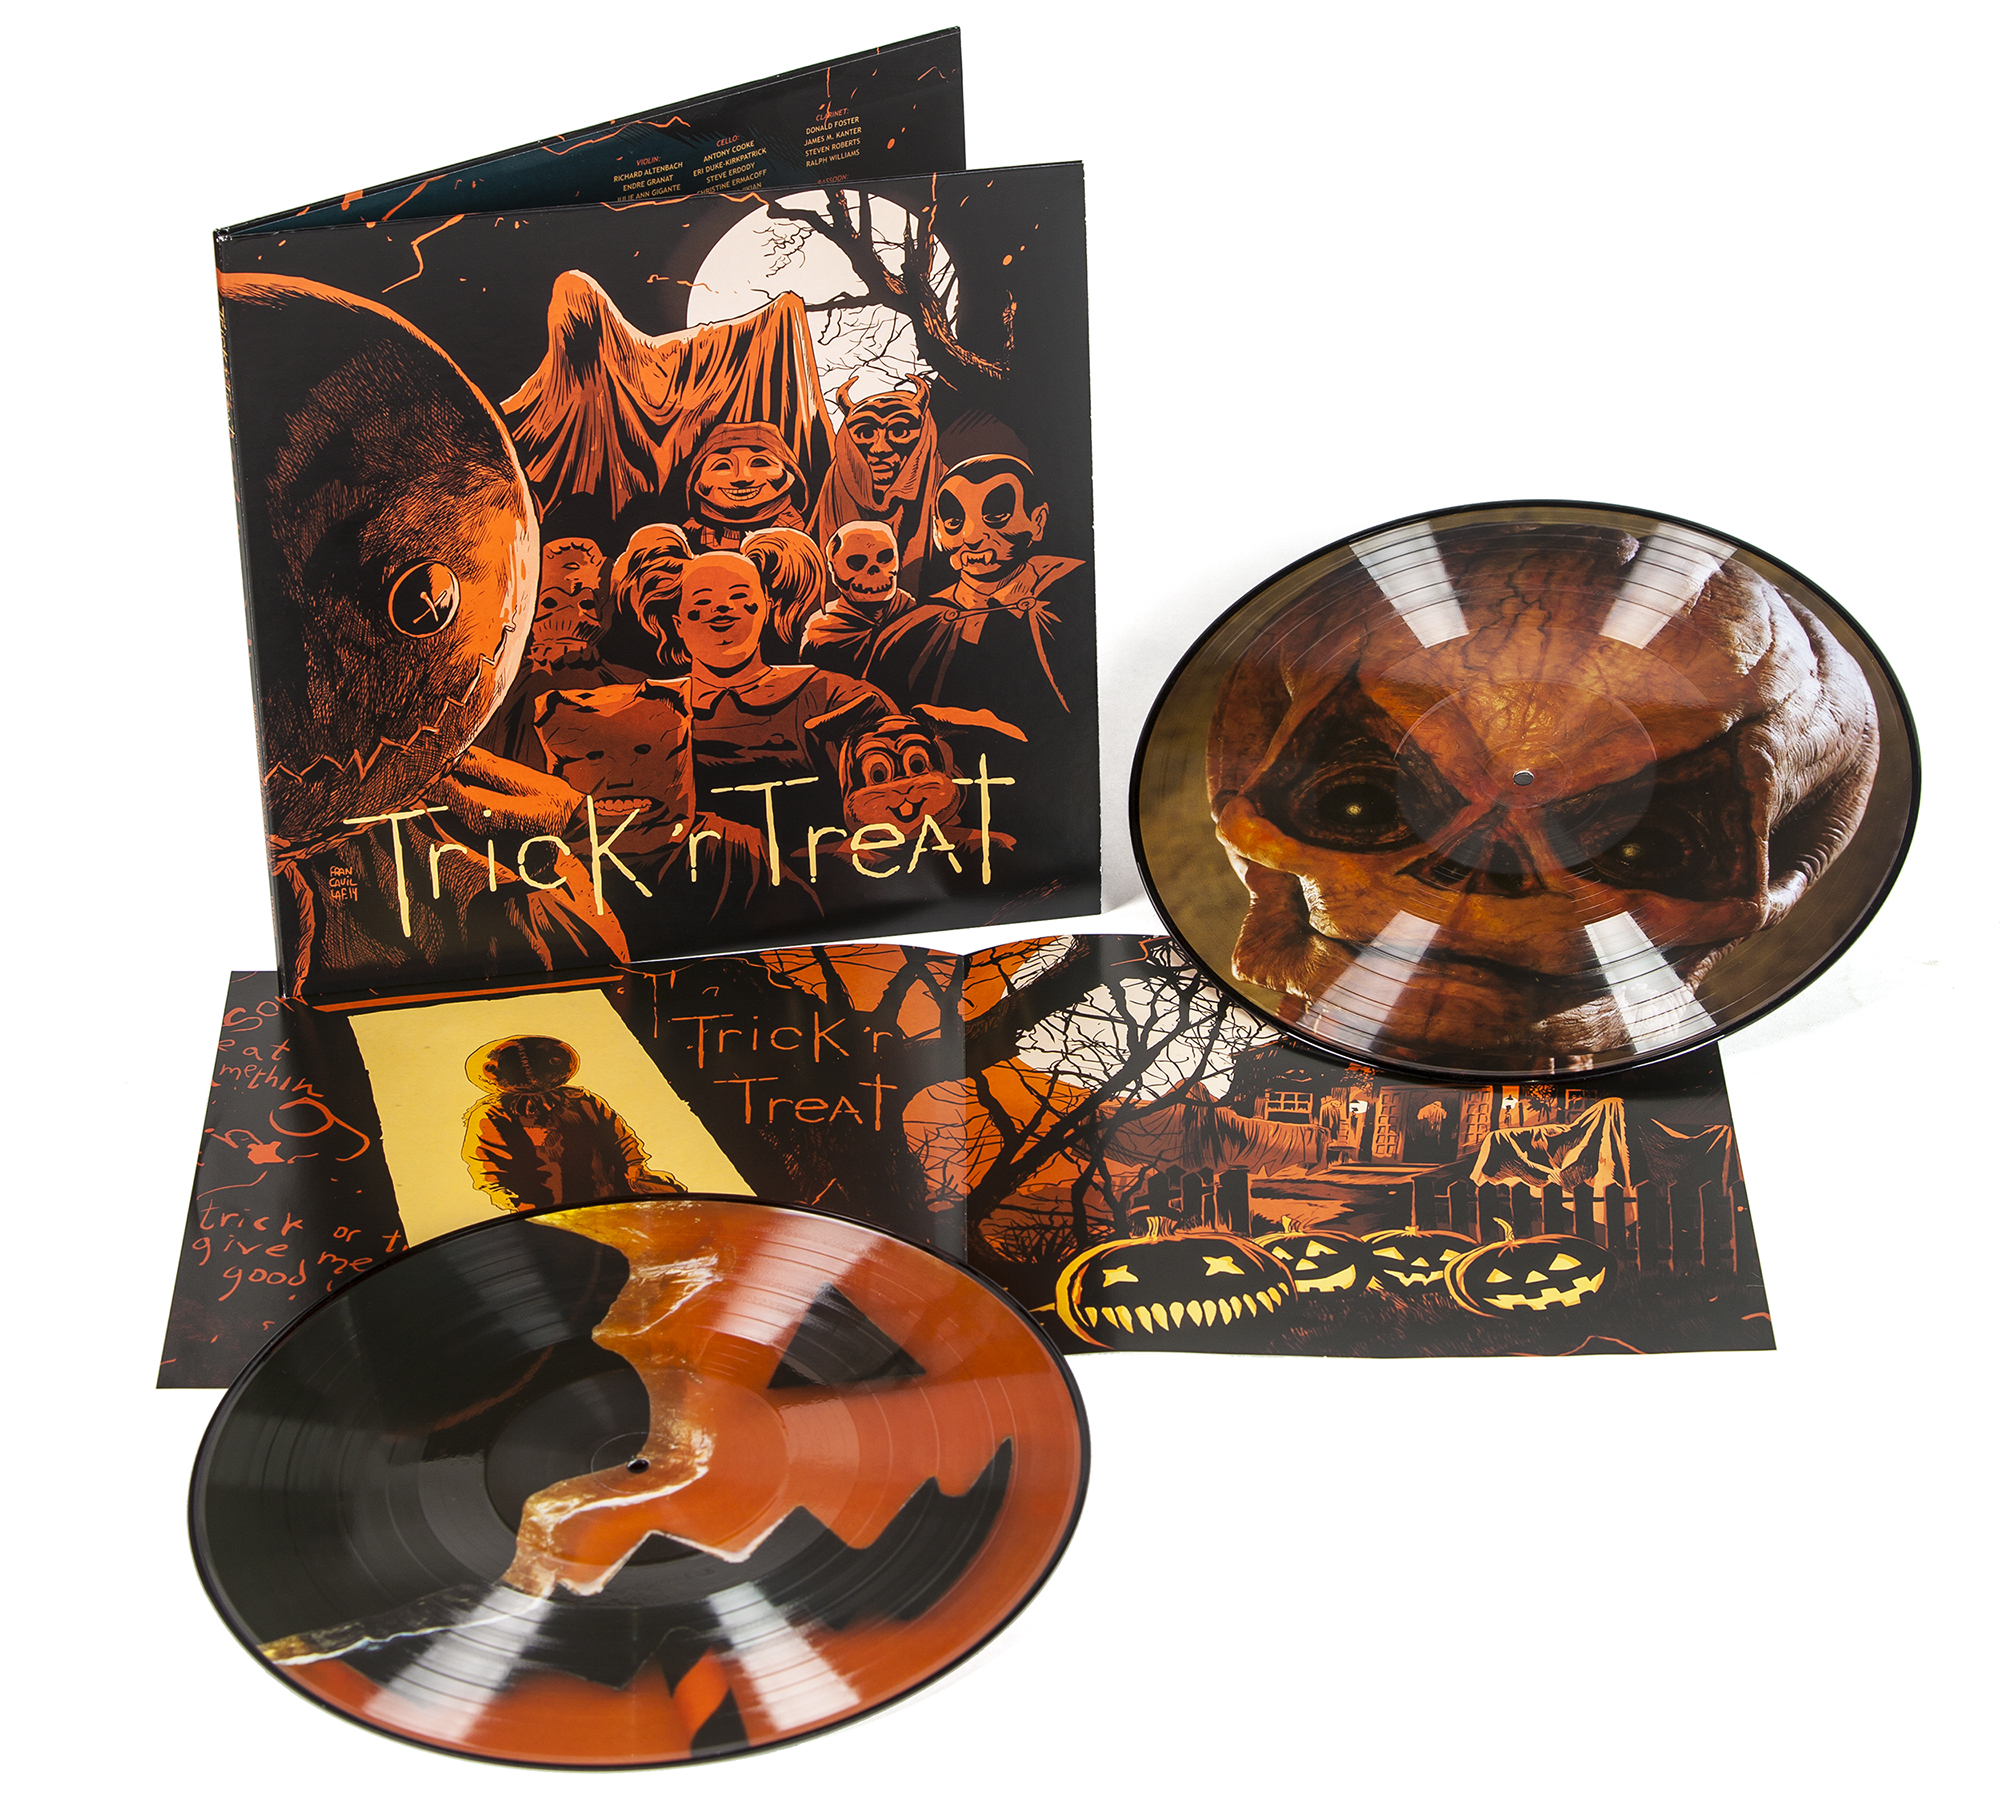 Trick R Treat Original 2007 Score Light In The Attic